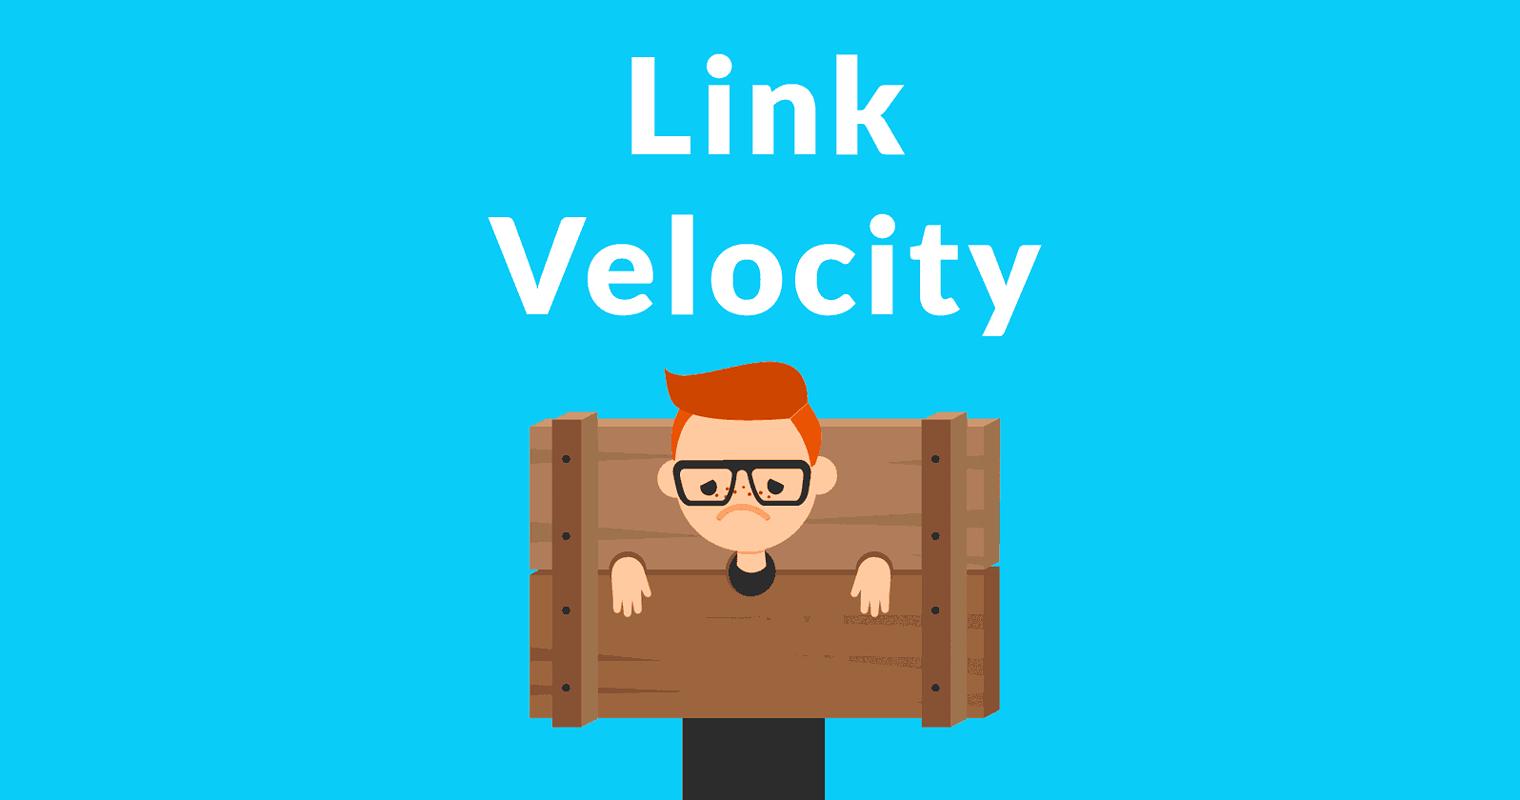 Google's John Mueller On Link Velocity and Penalties